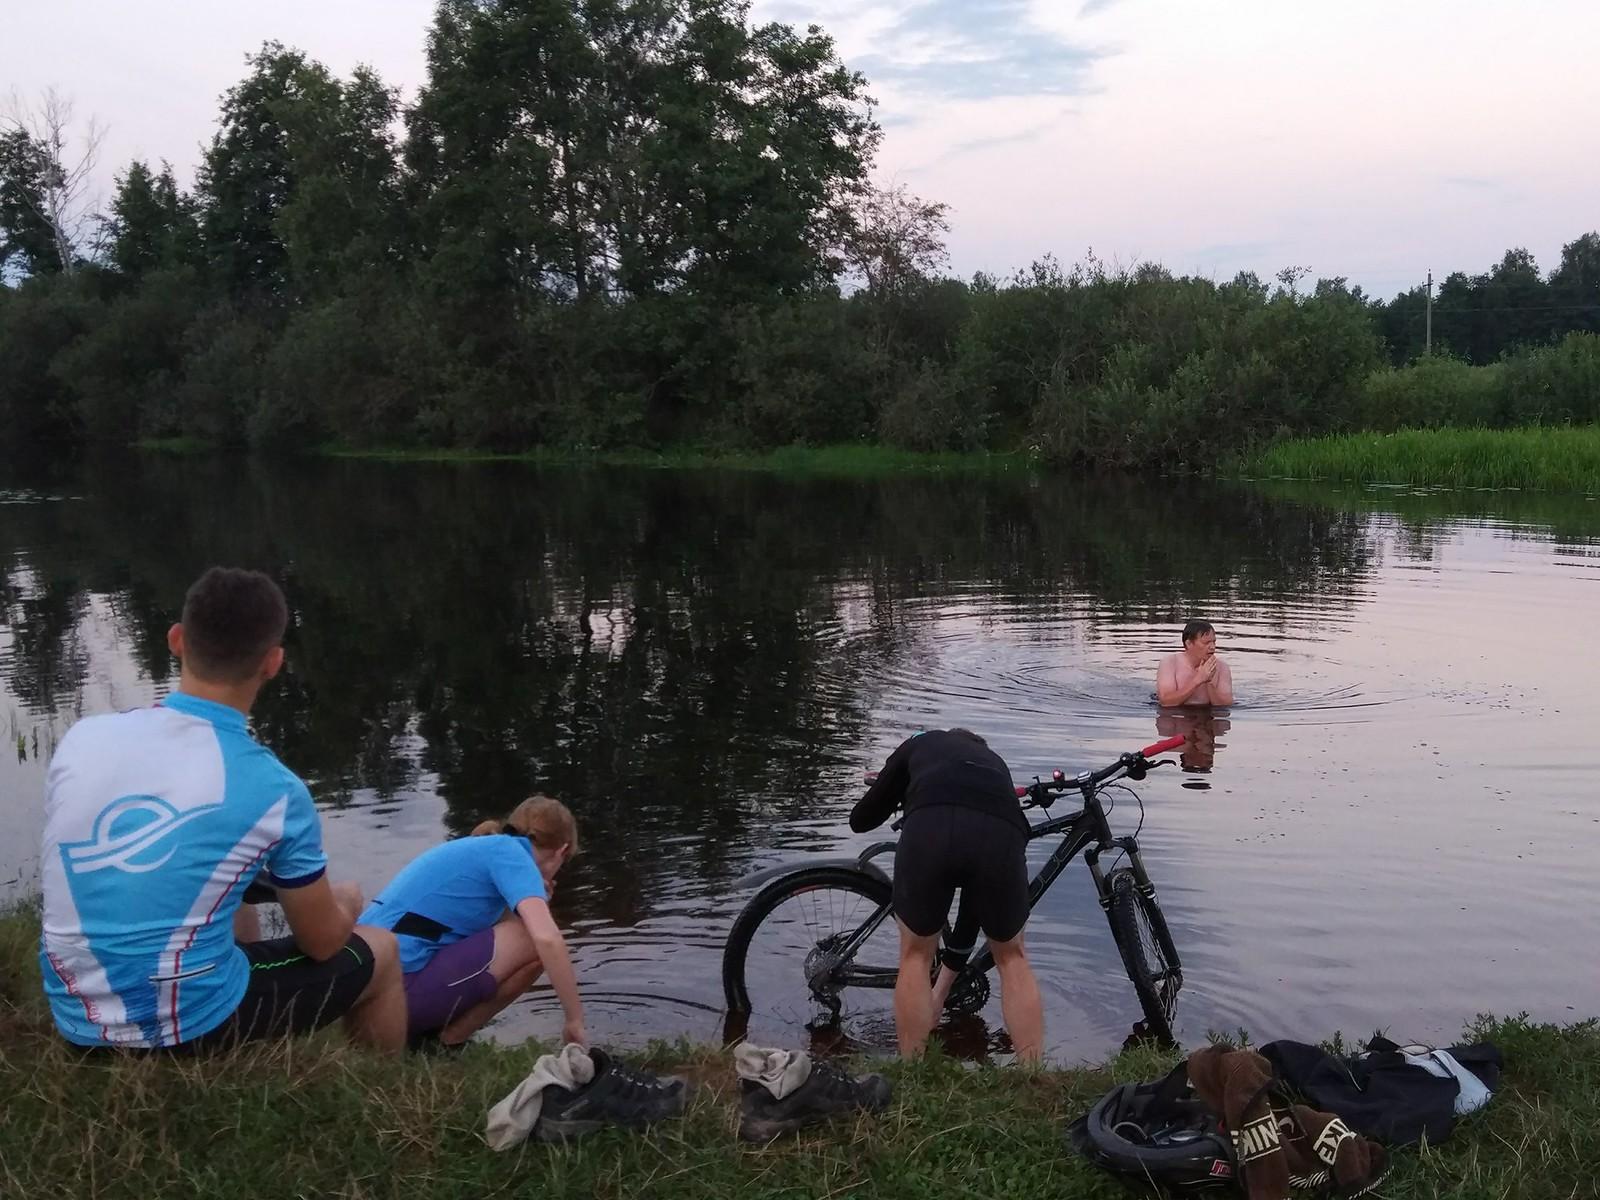 36397971405 fc2d0144fc h - Ночная велопокатушка 2017 (Тимковичи - Люща)